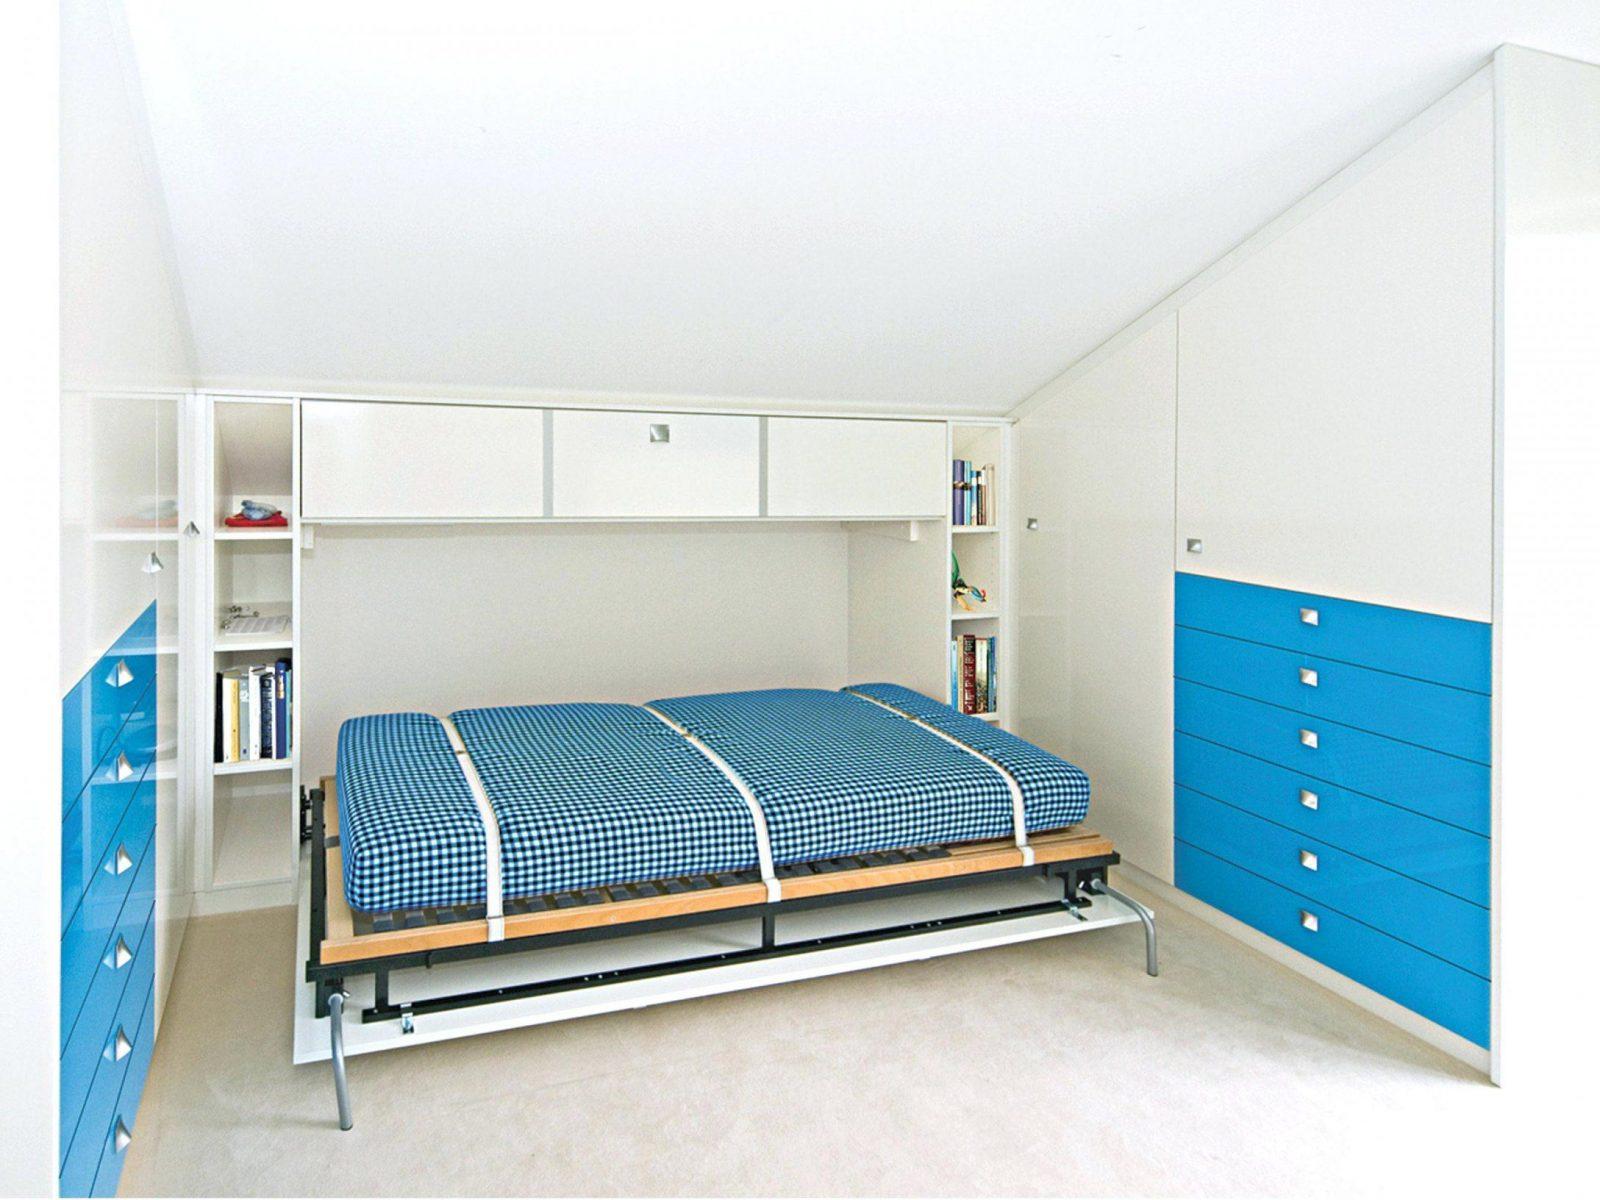 klappbett 140x200 selber bauen haus design ideen. Black Bedroom Furniture Sets. Home Design Ideas